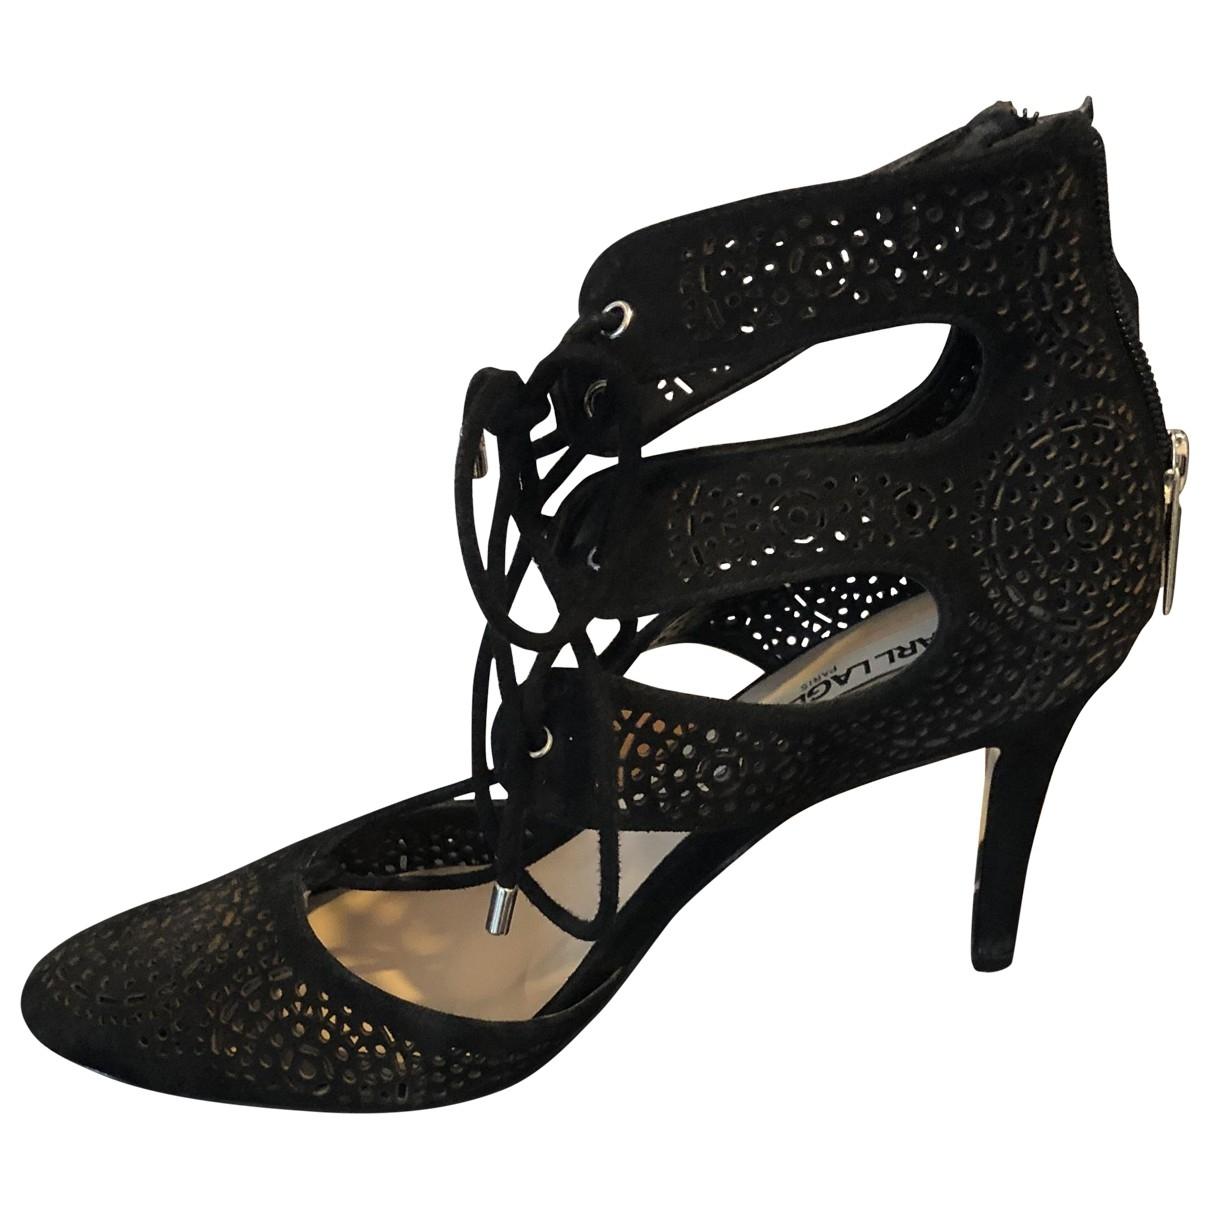 Karl Lagerfeld \N Black Leather Sandals for Women 38 EU